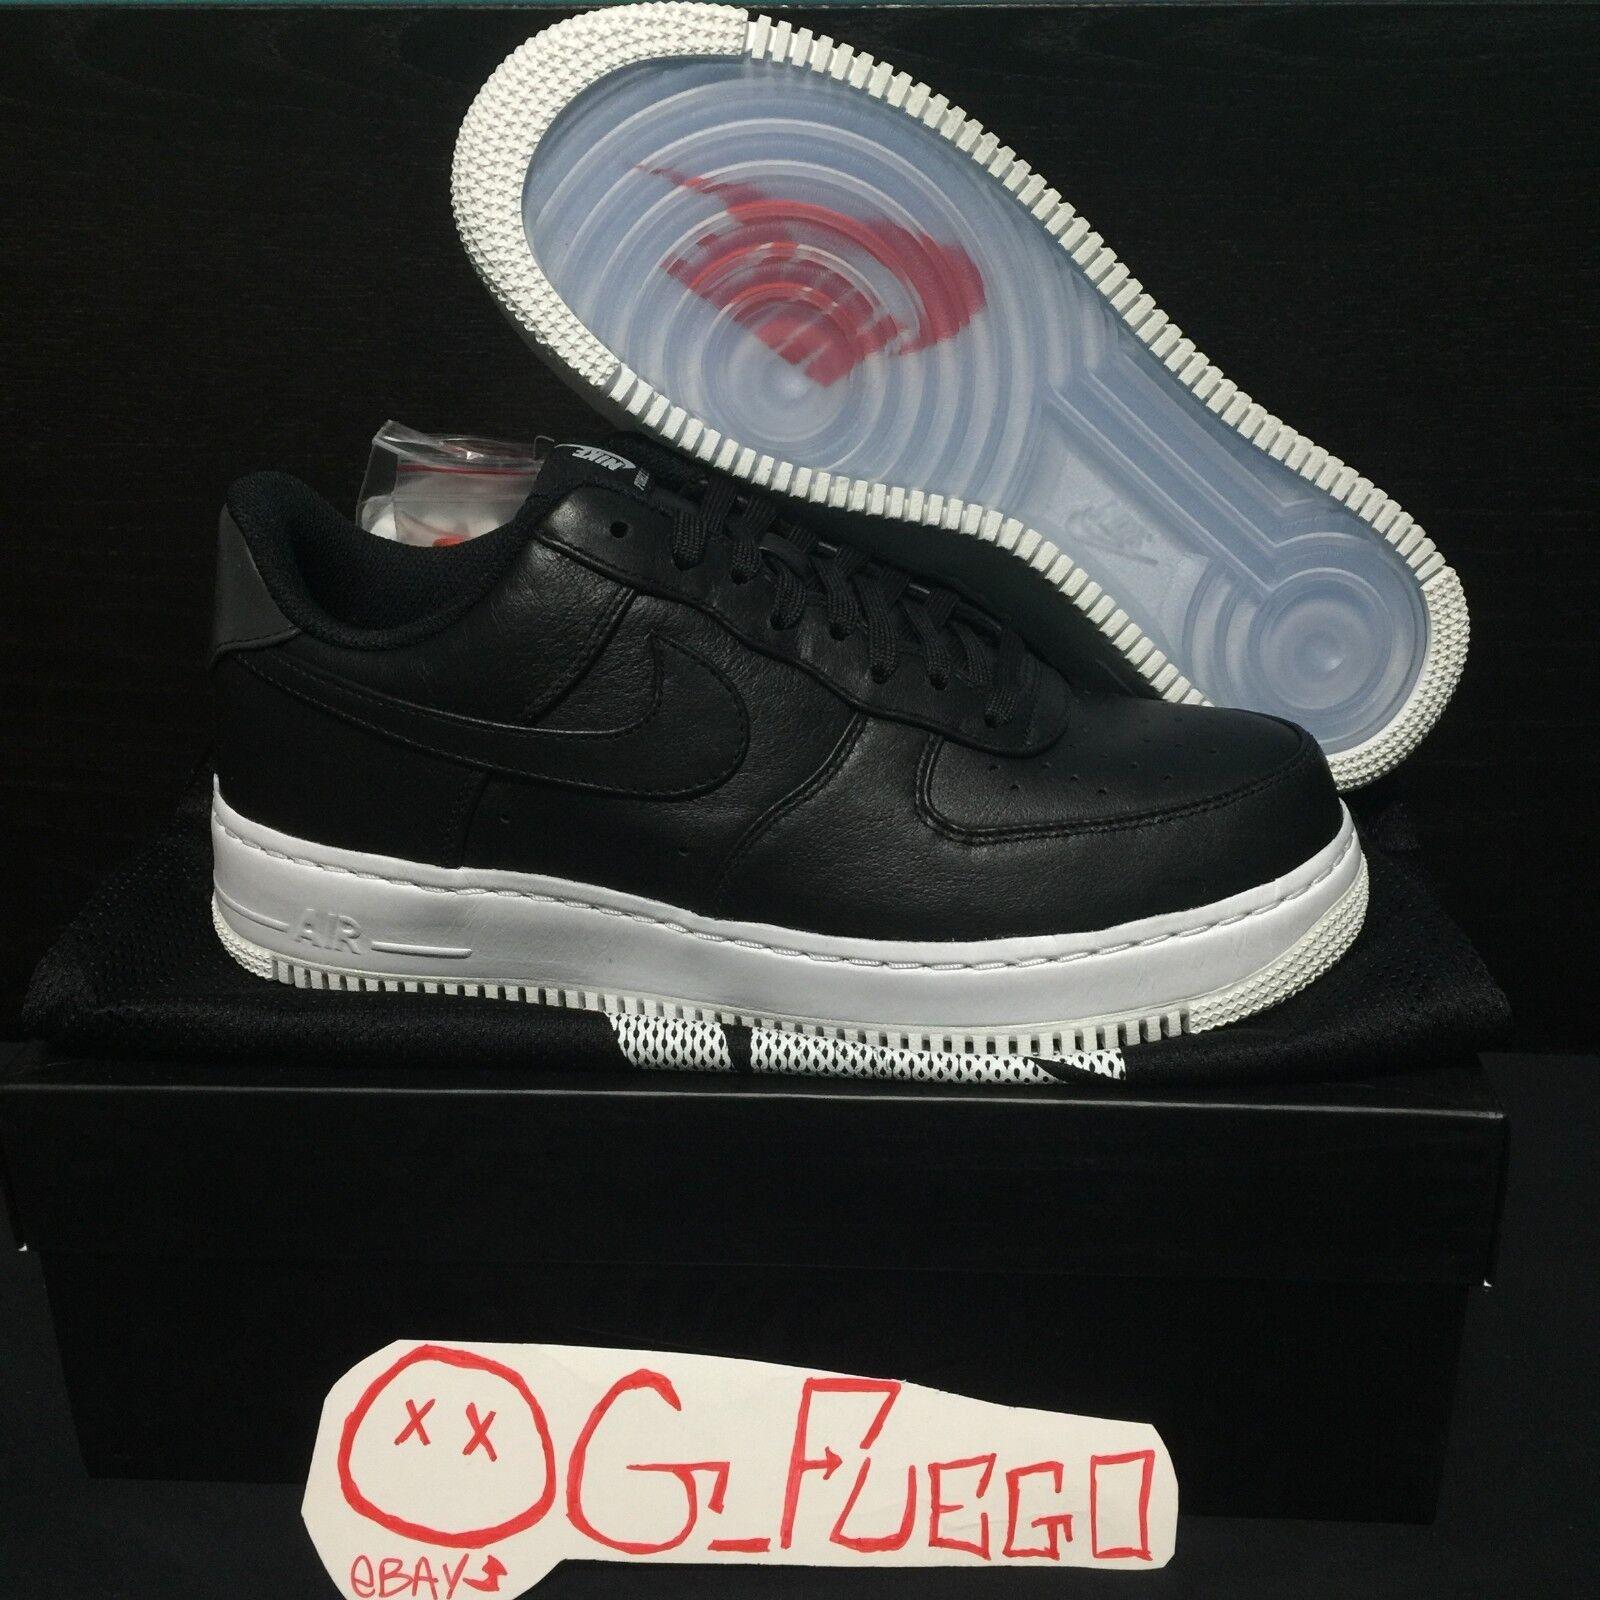 Nike Air Force 1 LOW CMFT SP 718078 008 NikeLab Black Men's Size 9